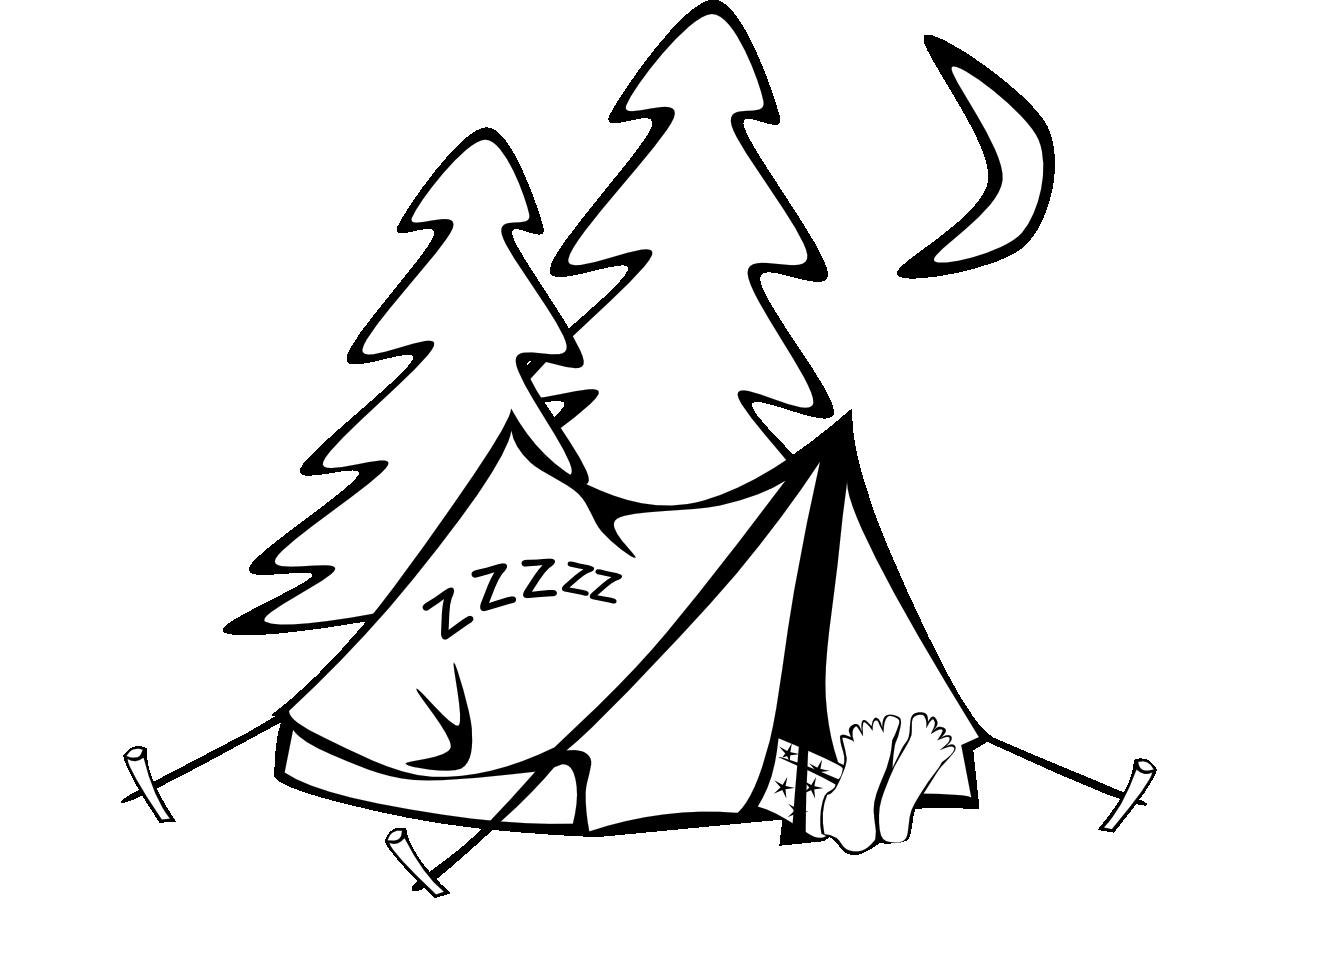 Clip art images free. Clipart tent bedouin tent